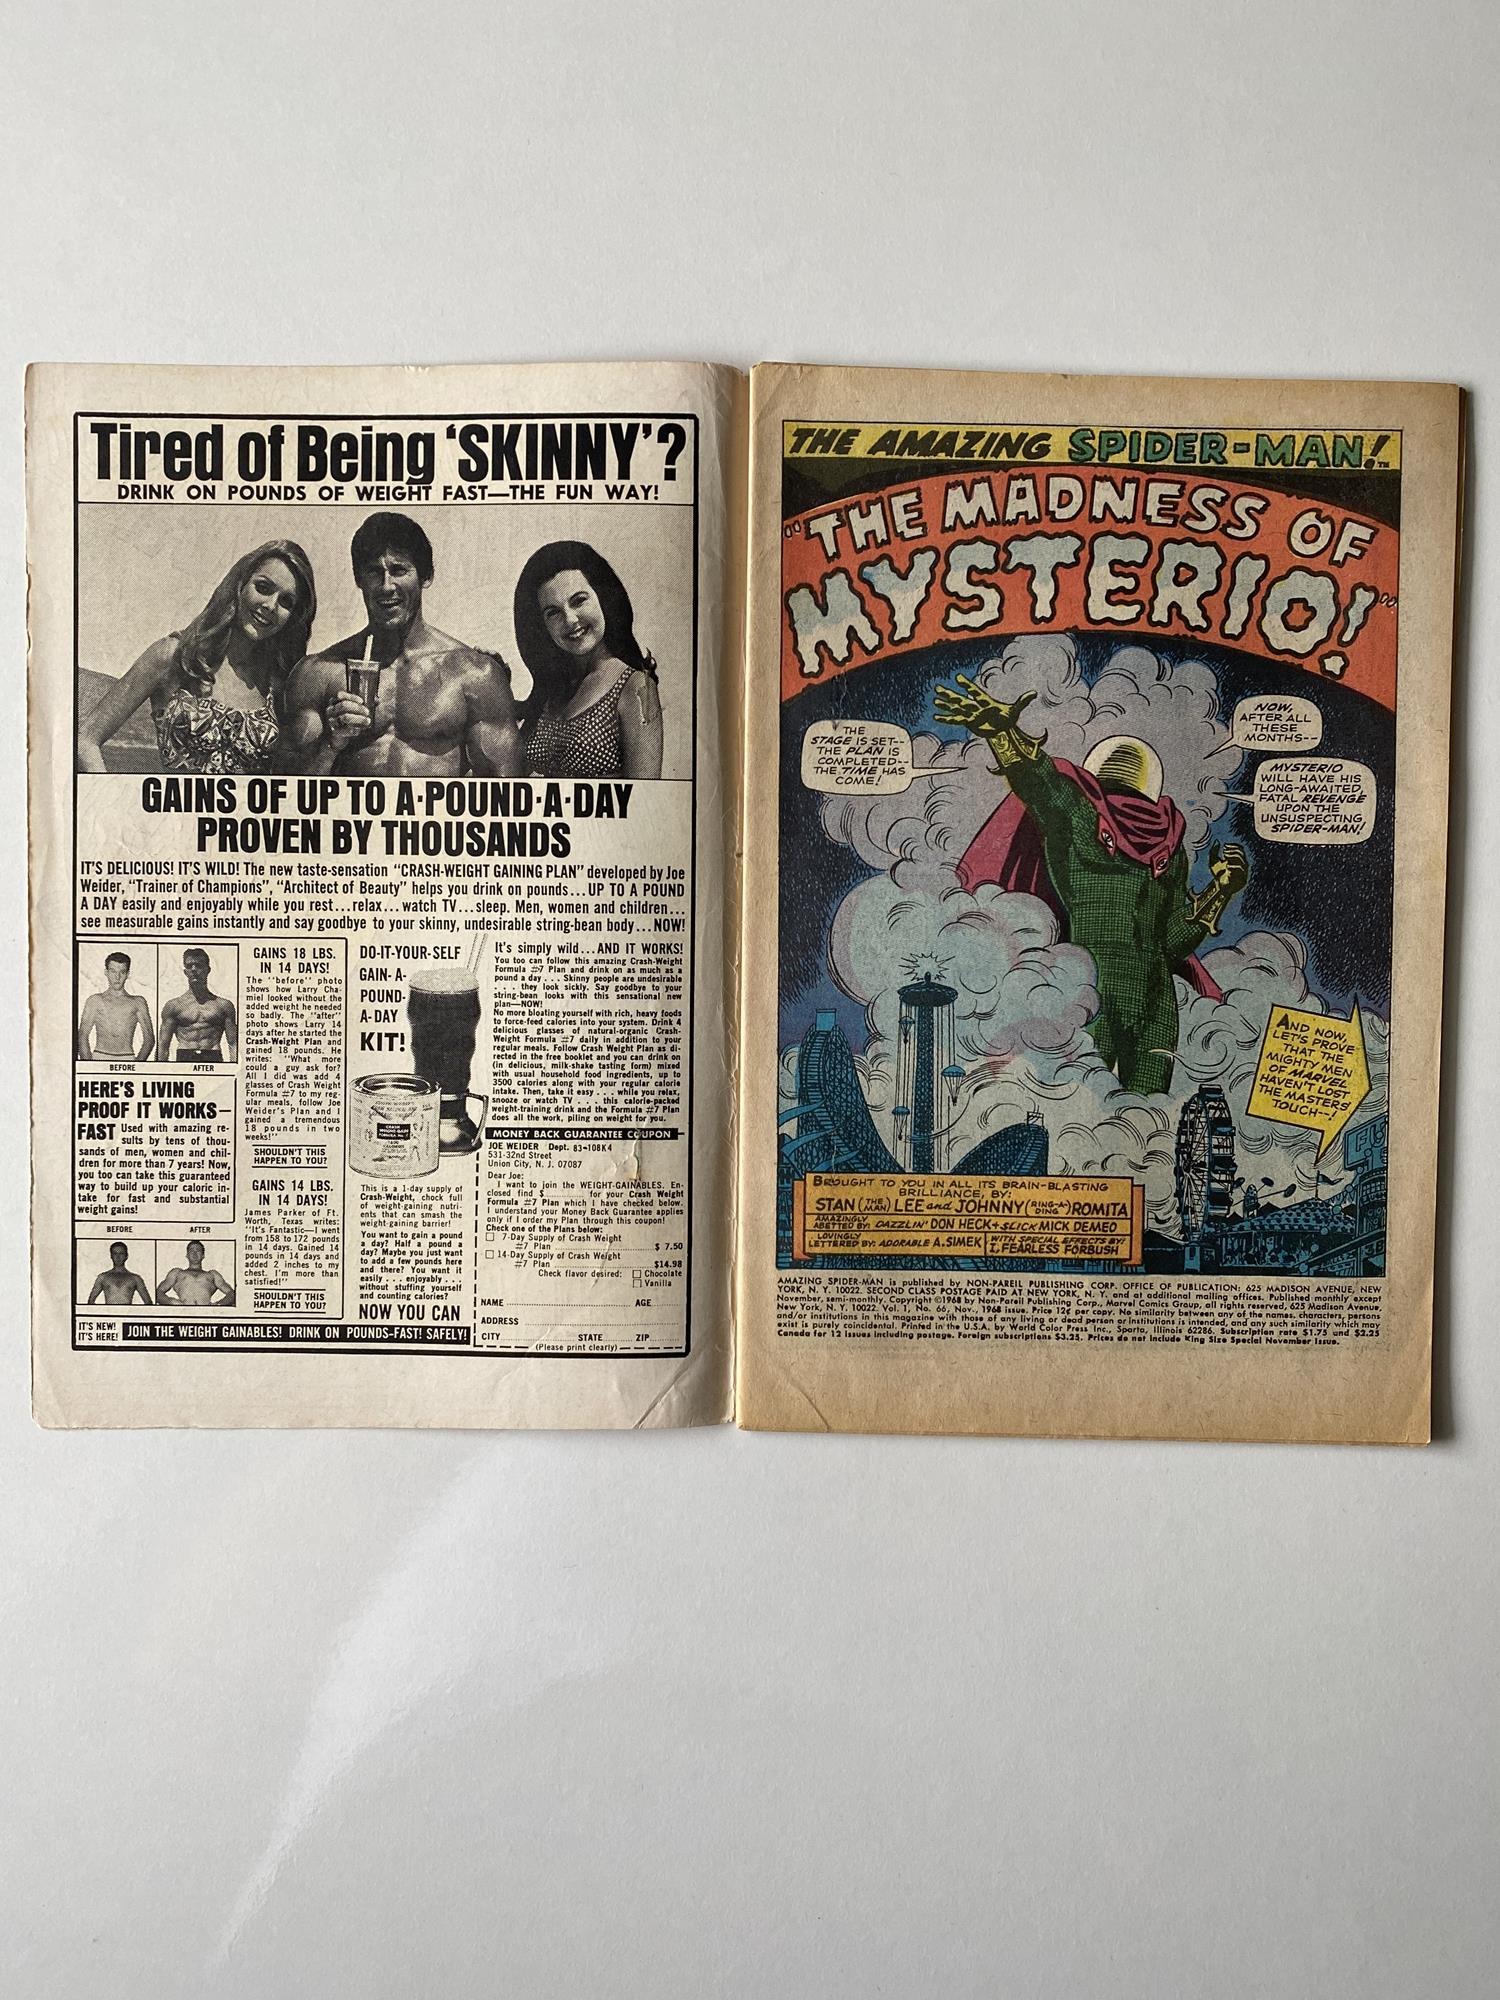 Lot 27 - AMAZING SPIDER-MAN # 66 (1968 - MARVEL - Cents Copy) - Spider-Man battles Mysterio. + Green Goblin